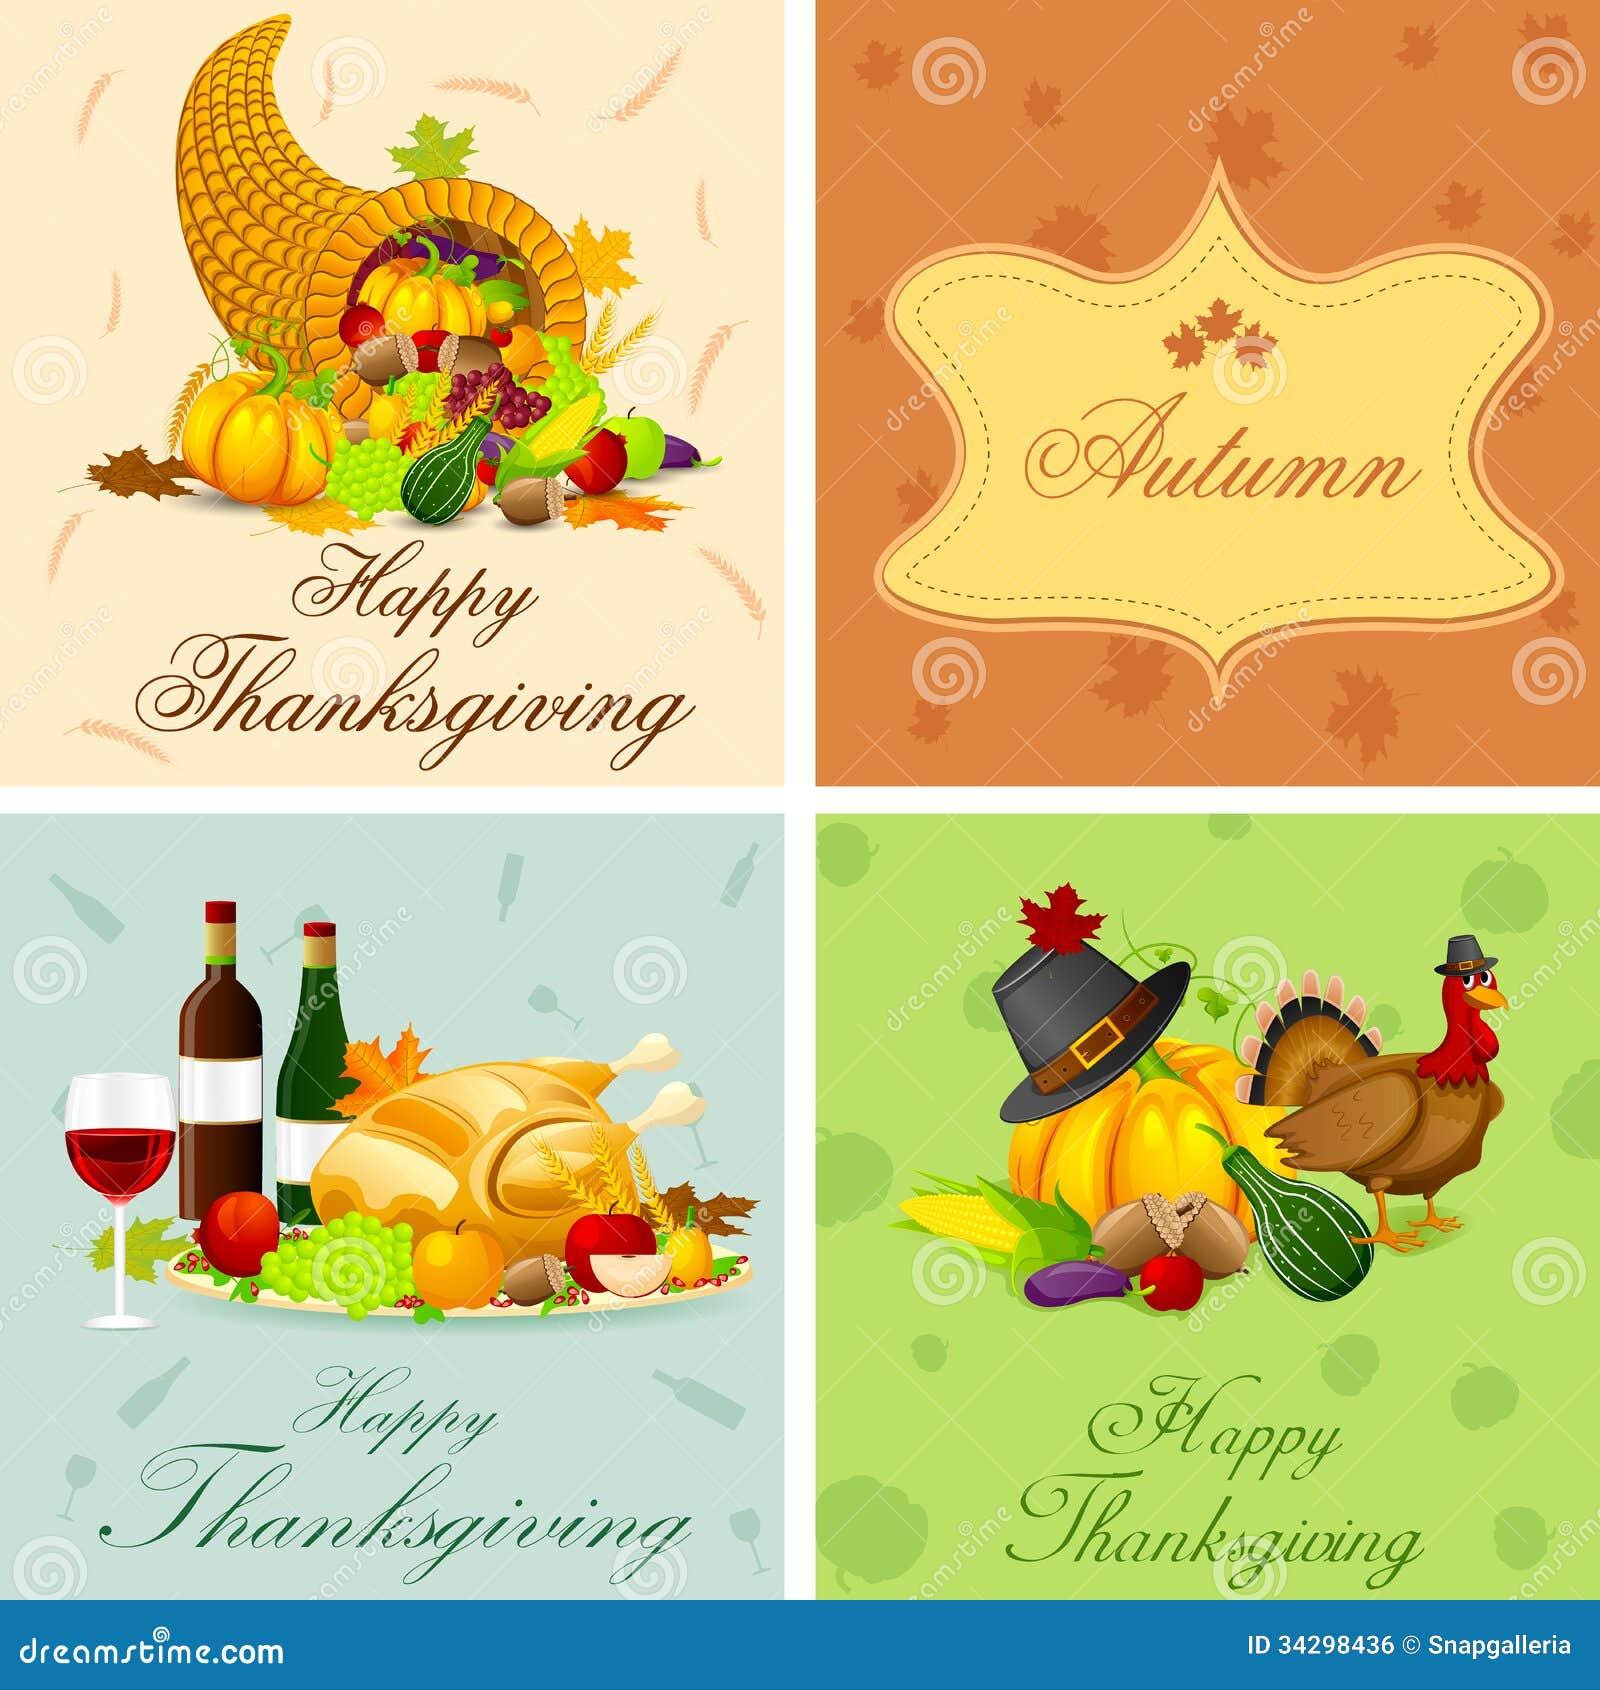 Thanksgiving Harvesting Festival Royalty Free Stock Image